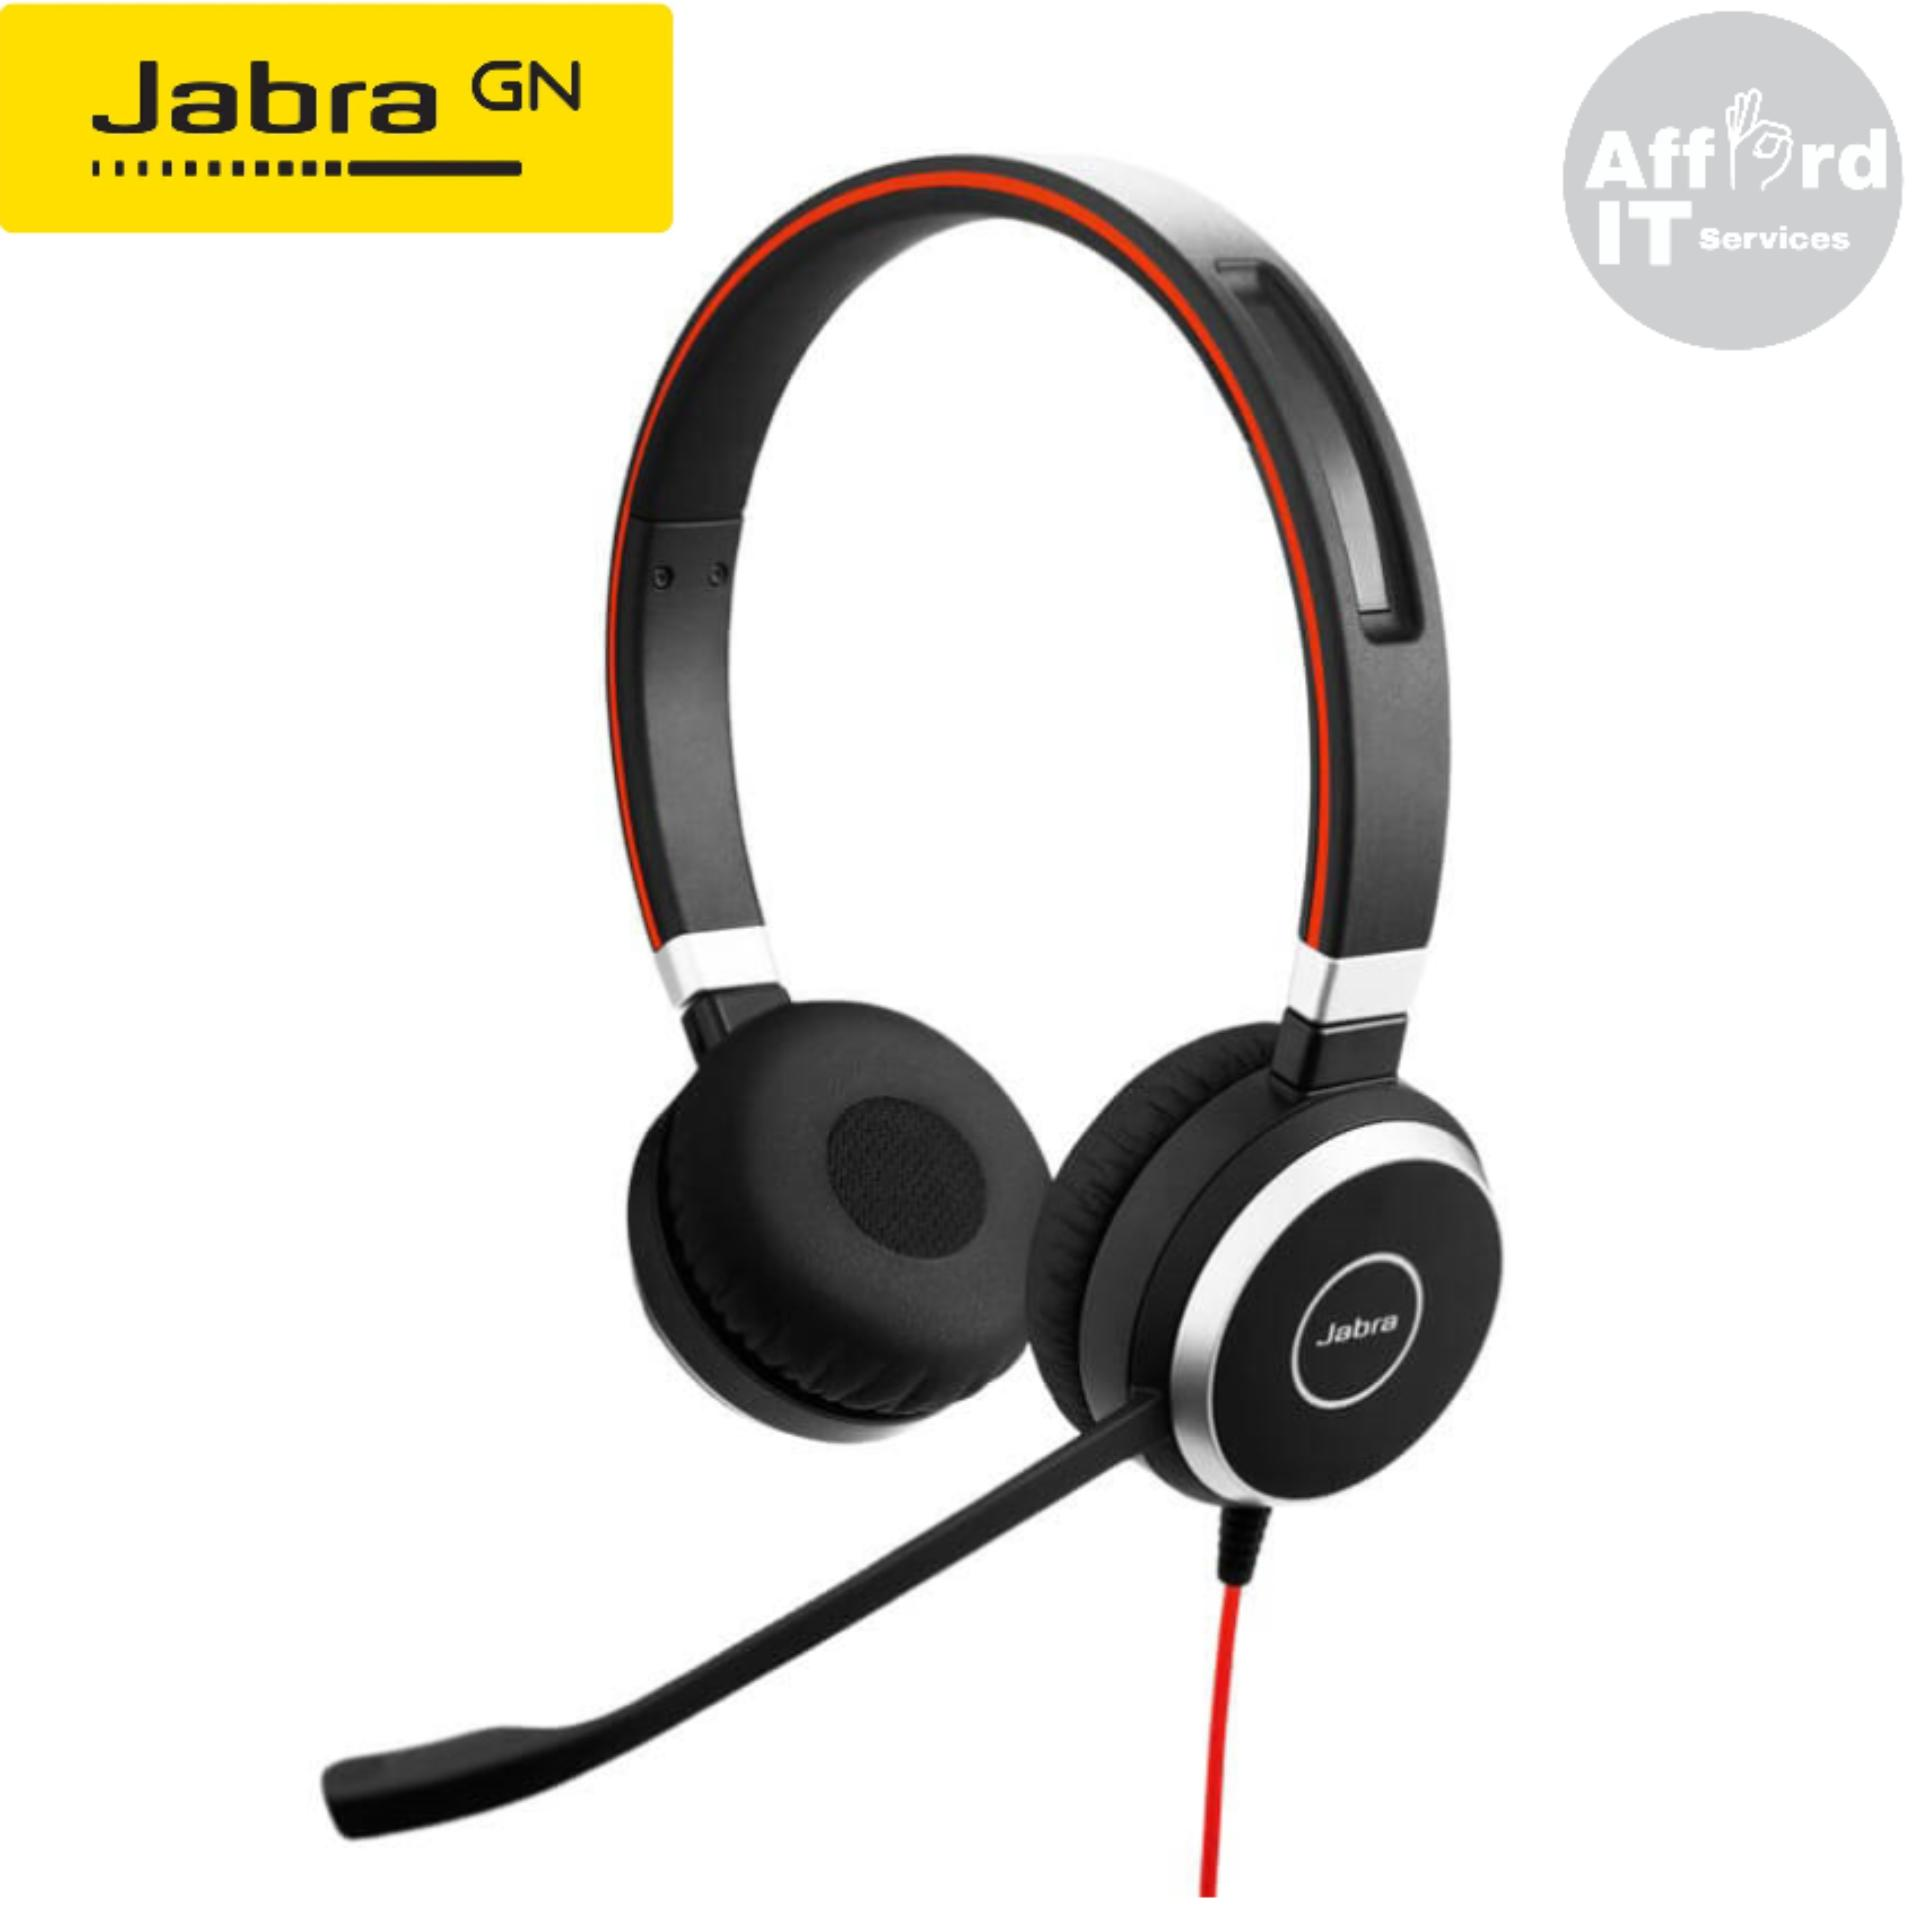 05057e28de9 Jabra Over the ear Headphone Philippines - Jabra Over the ear ...